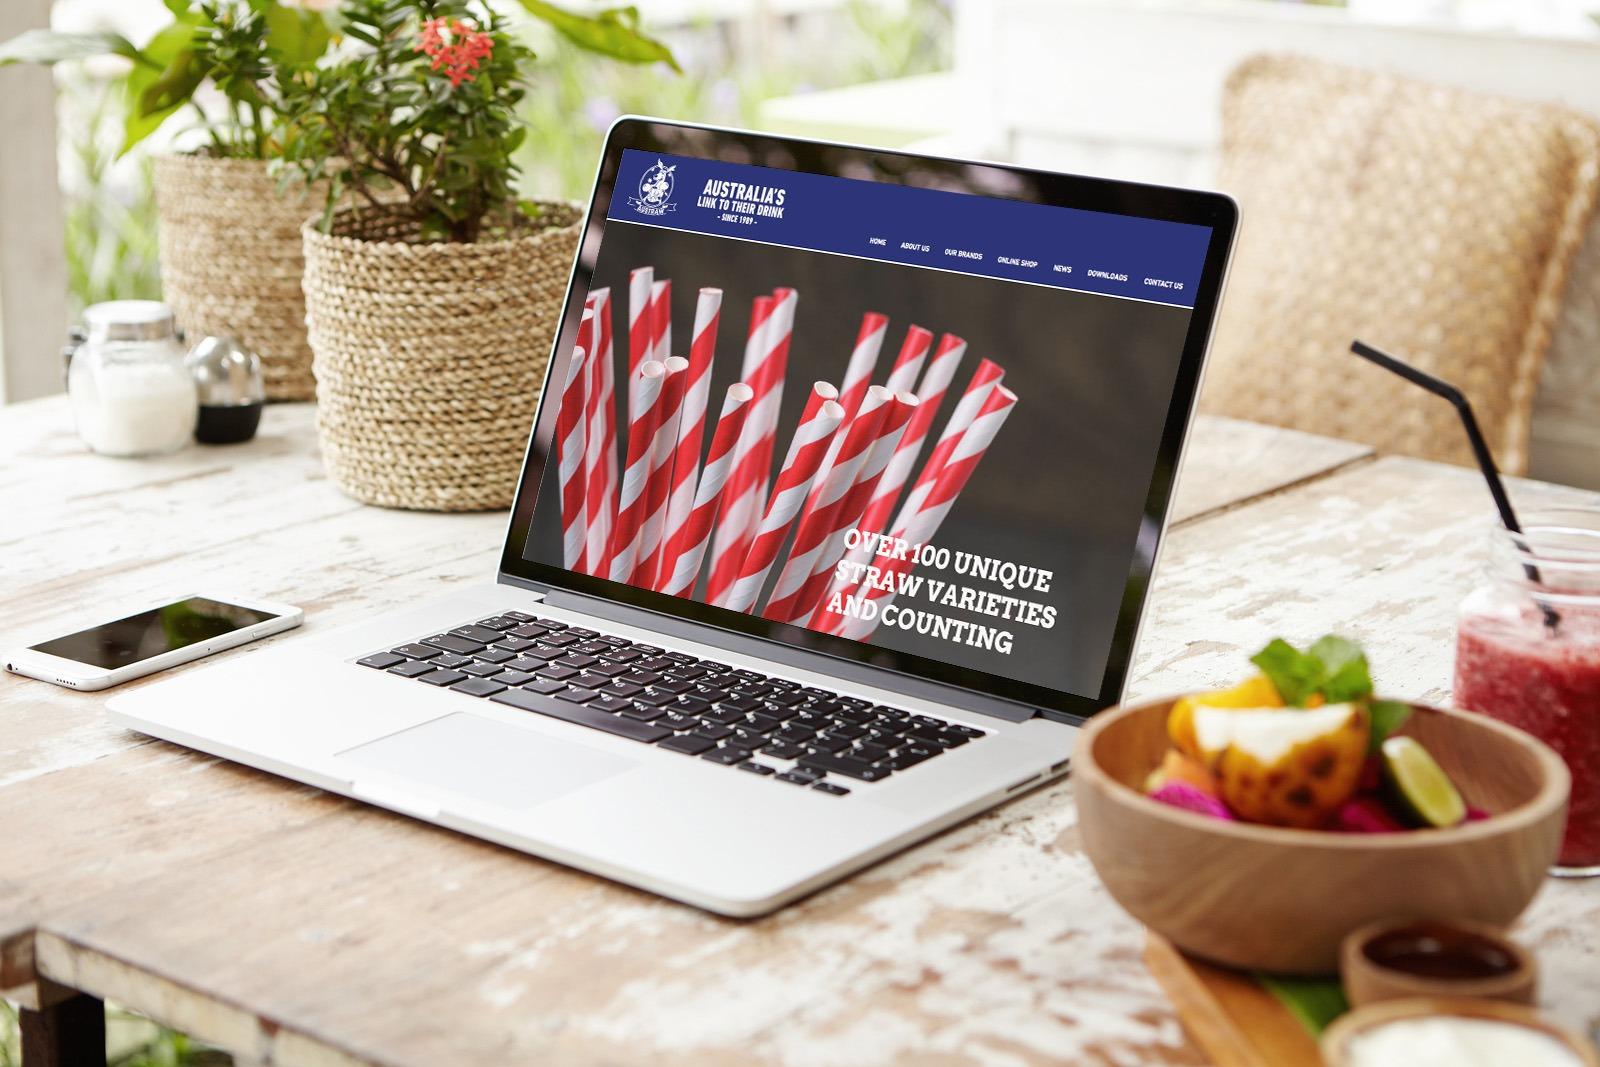 Austraw website design home page